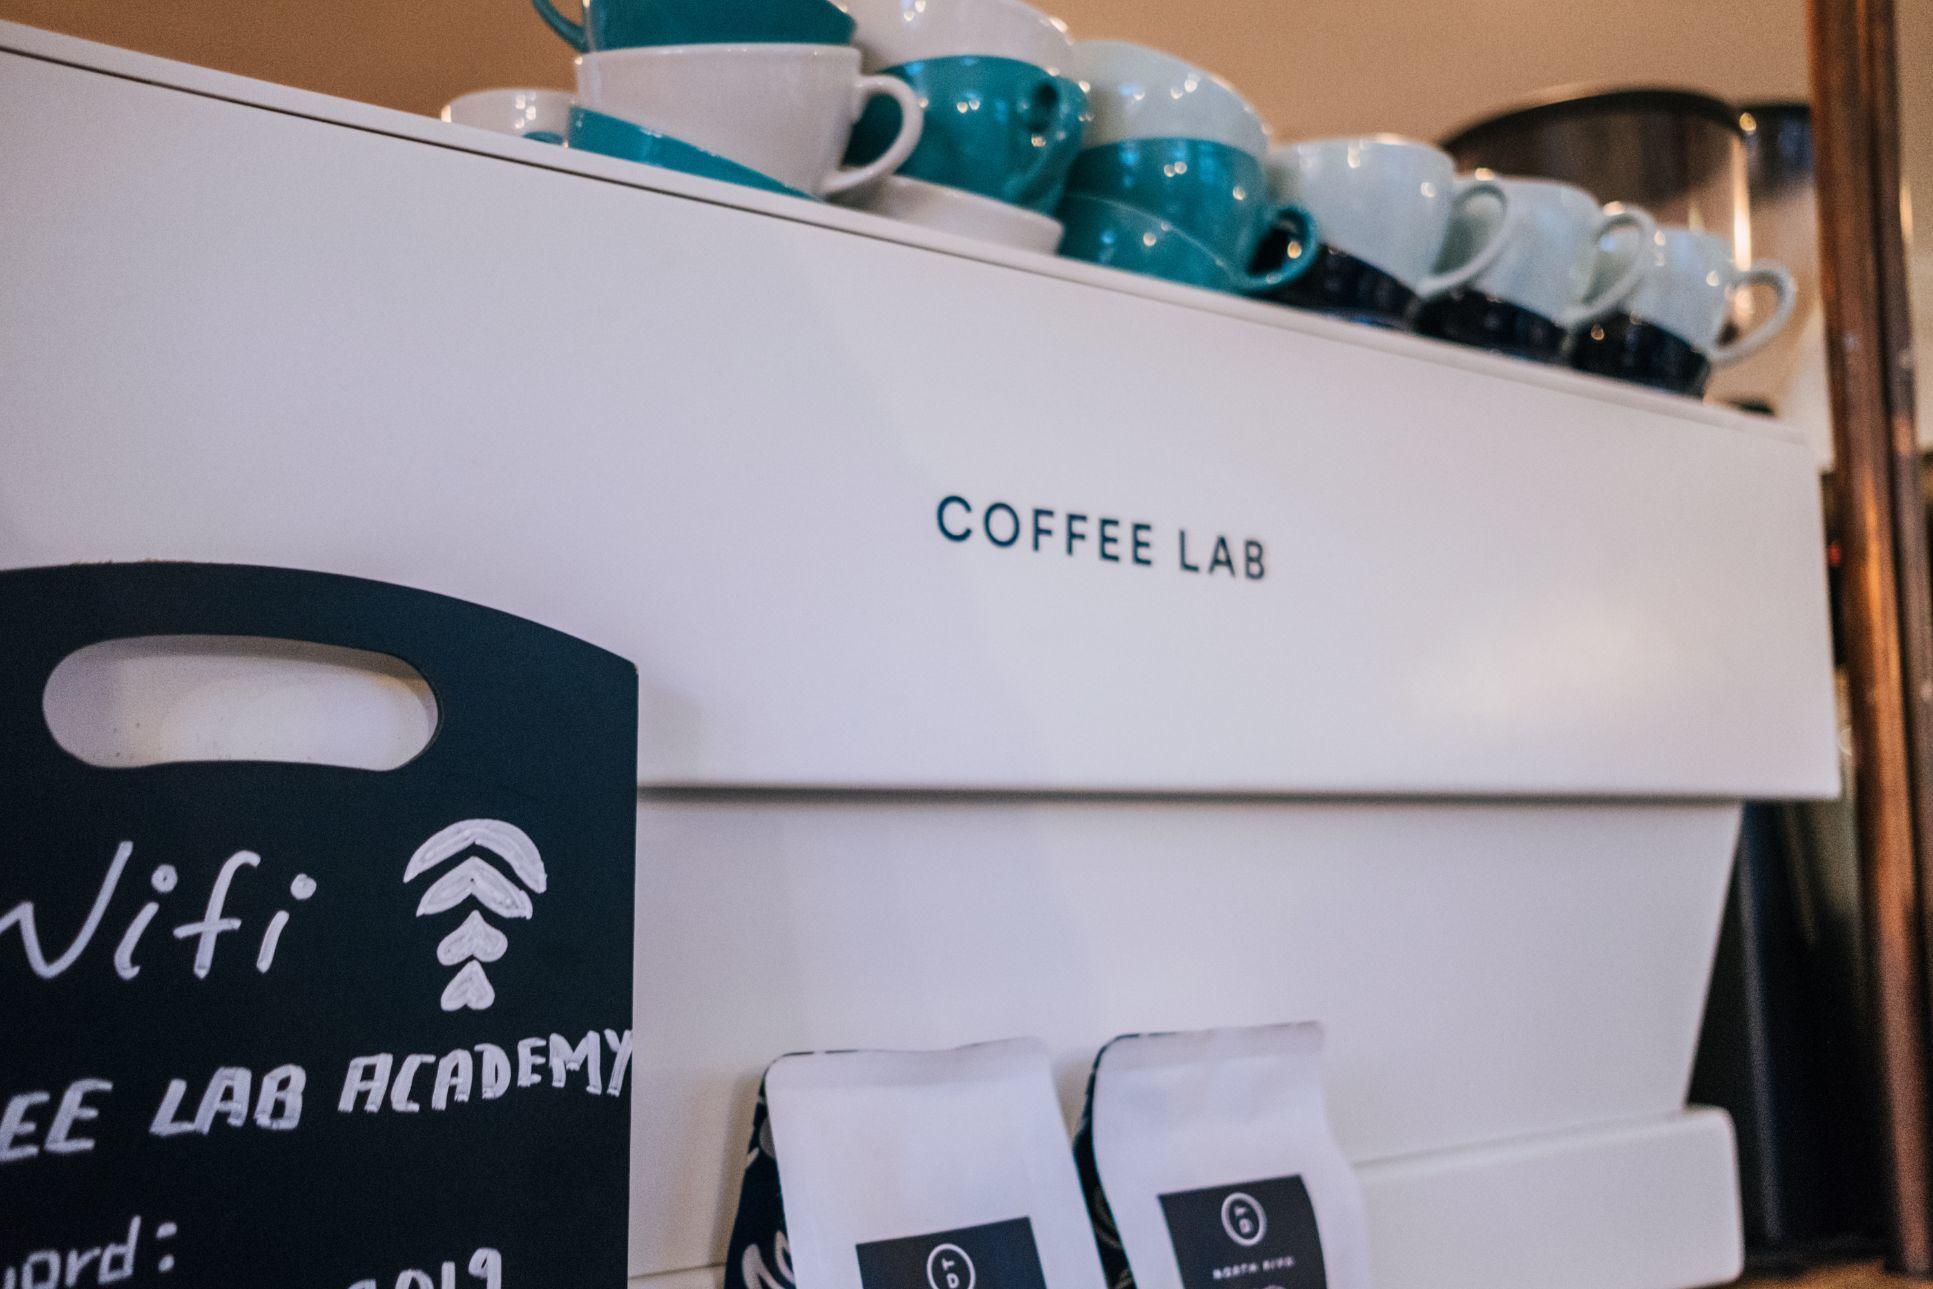 Coffee Lab (London Road)